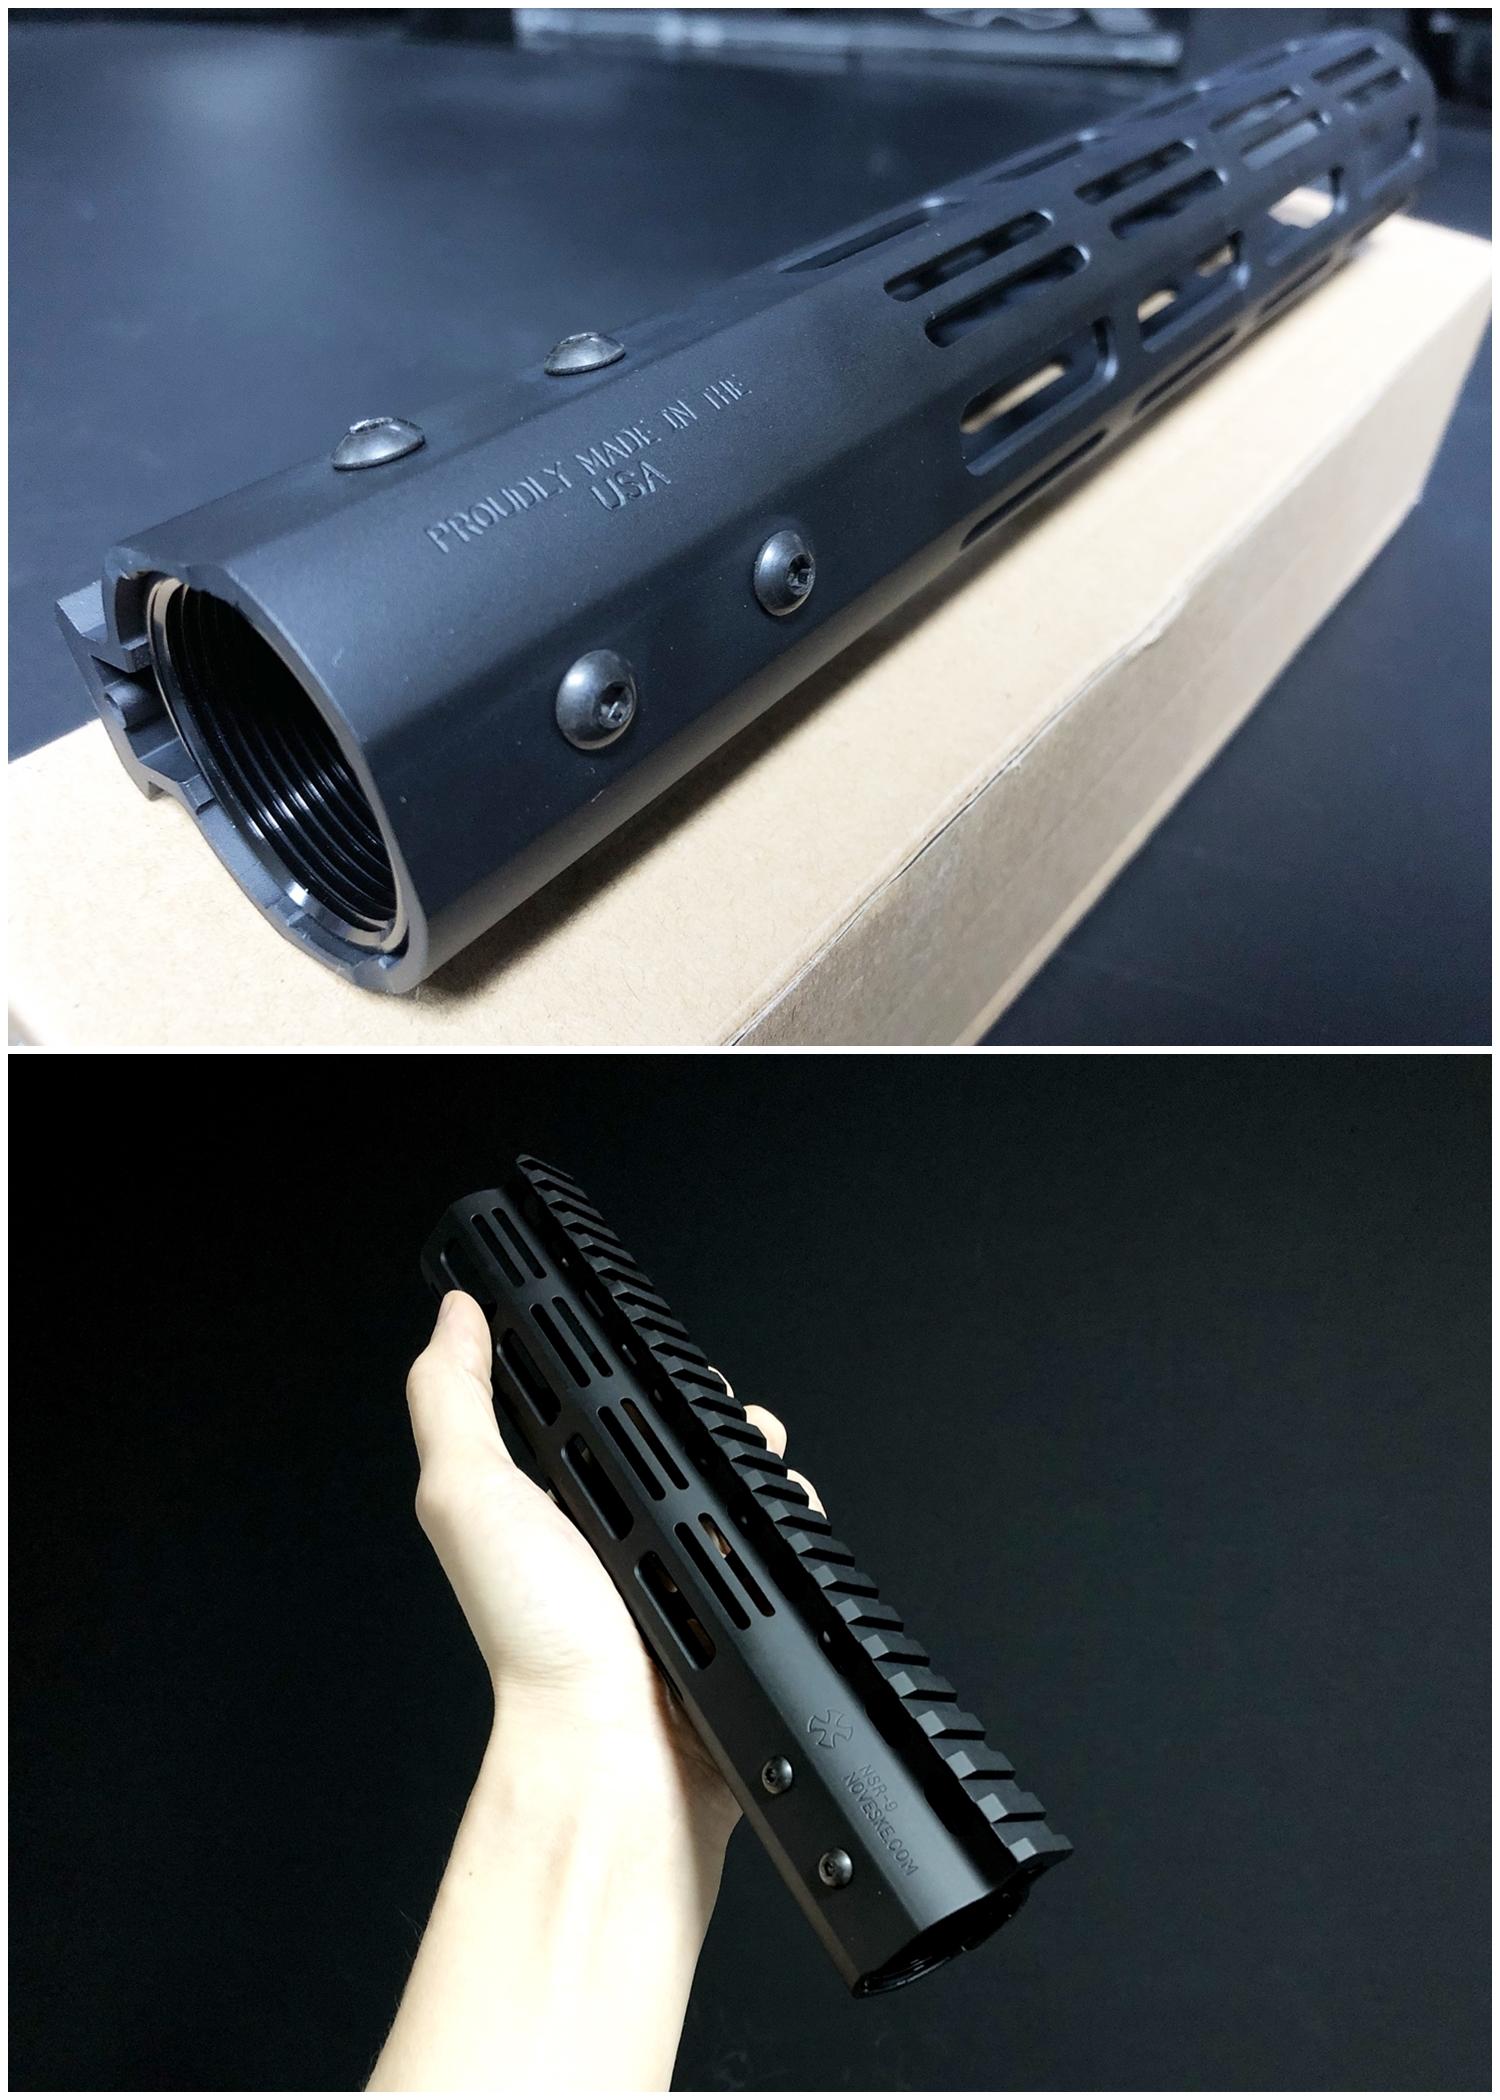 4 IRON AIRSOFT M-LOK NOVESKE TYPE 9inch NSR RAS N4 M4 AR15 次世代 CQB-R ノベスケ ハンドガード 購入~取付 分解 交換 検証 レビュー!!